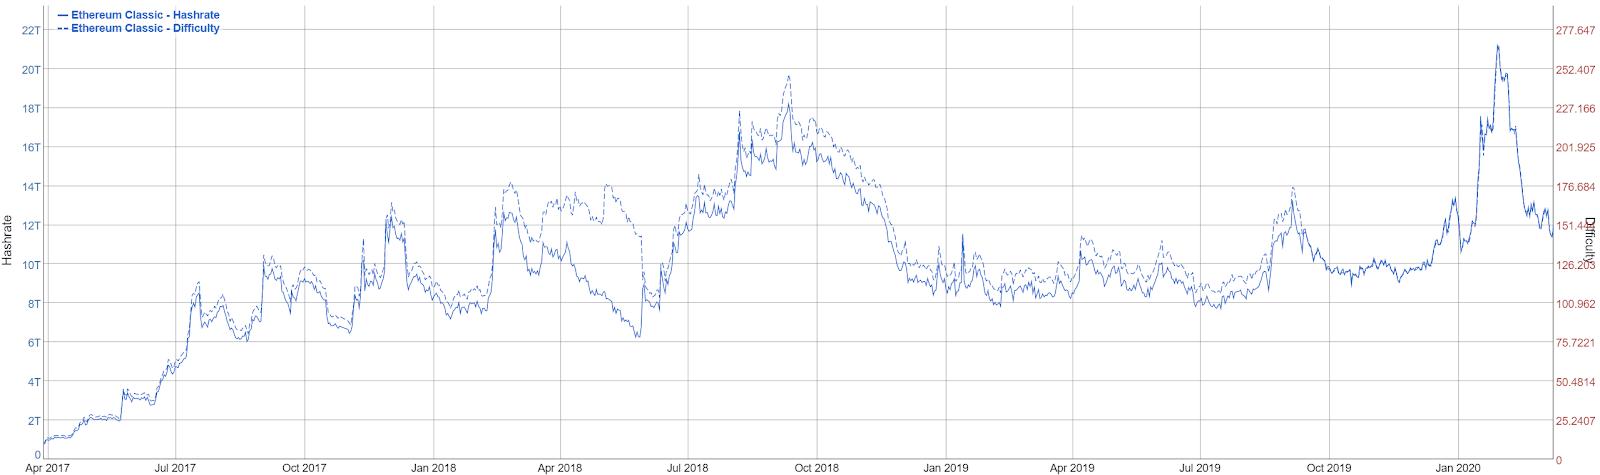 Ethereum Classic Price Analysis 11 Mar 2020 (5)